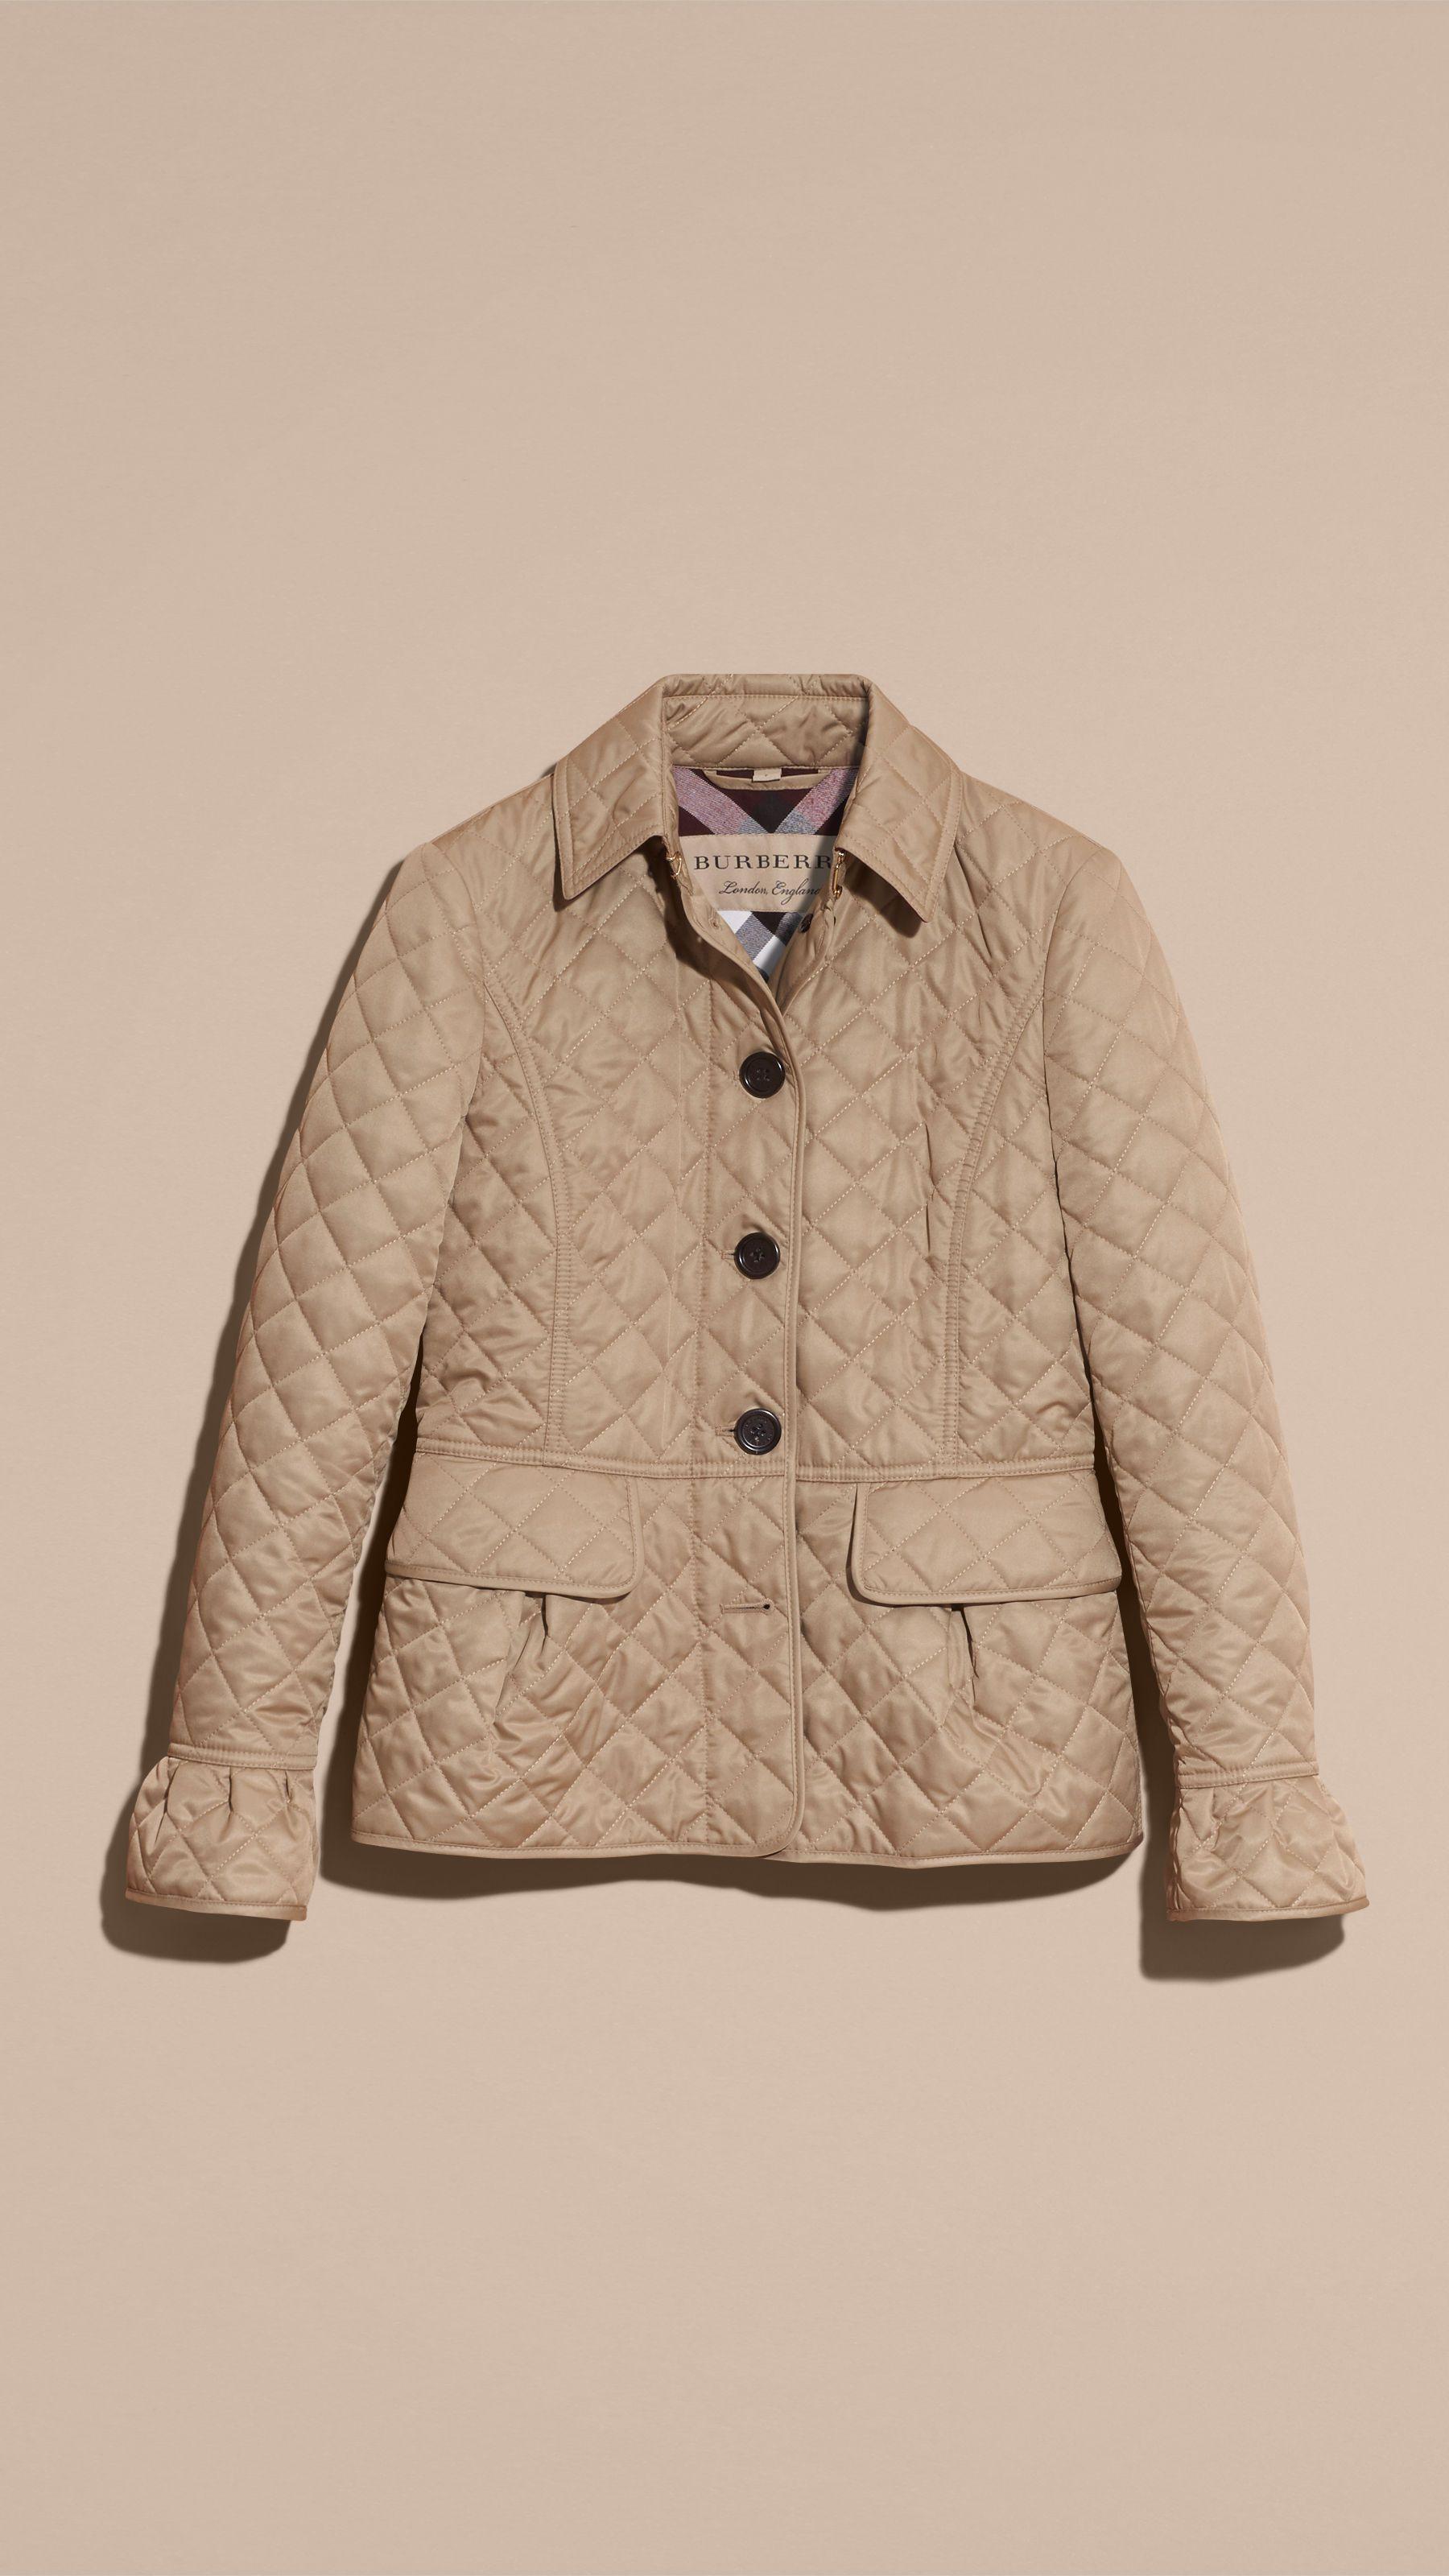 Diamond Quilted Peplum Jacket Canvas Burberry Quilted Jacket Jackets Quilted Coat